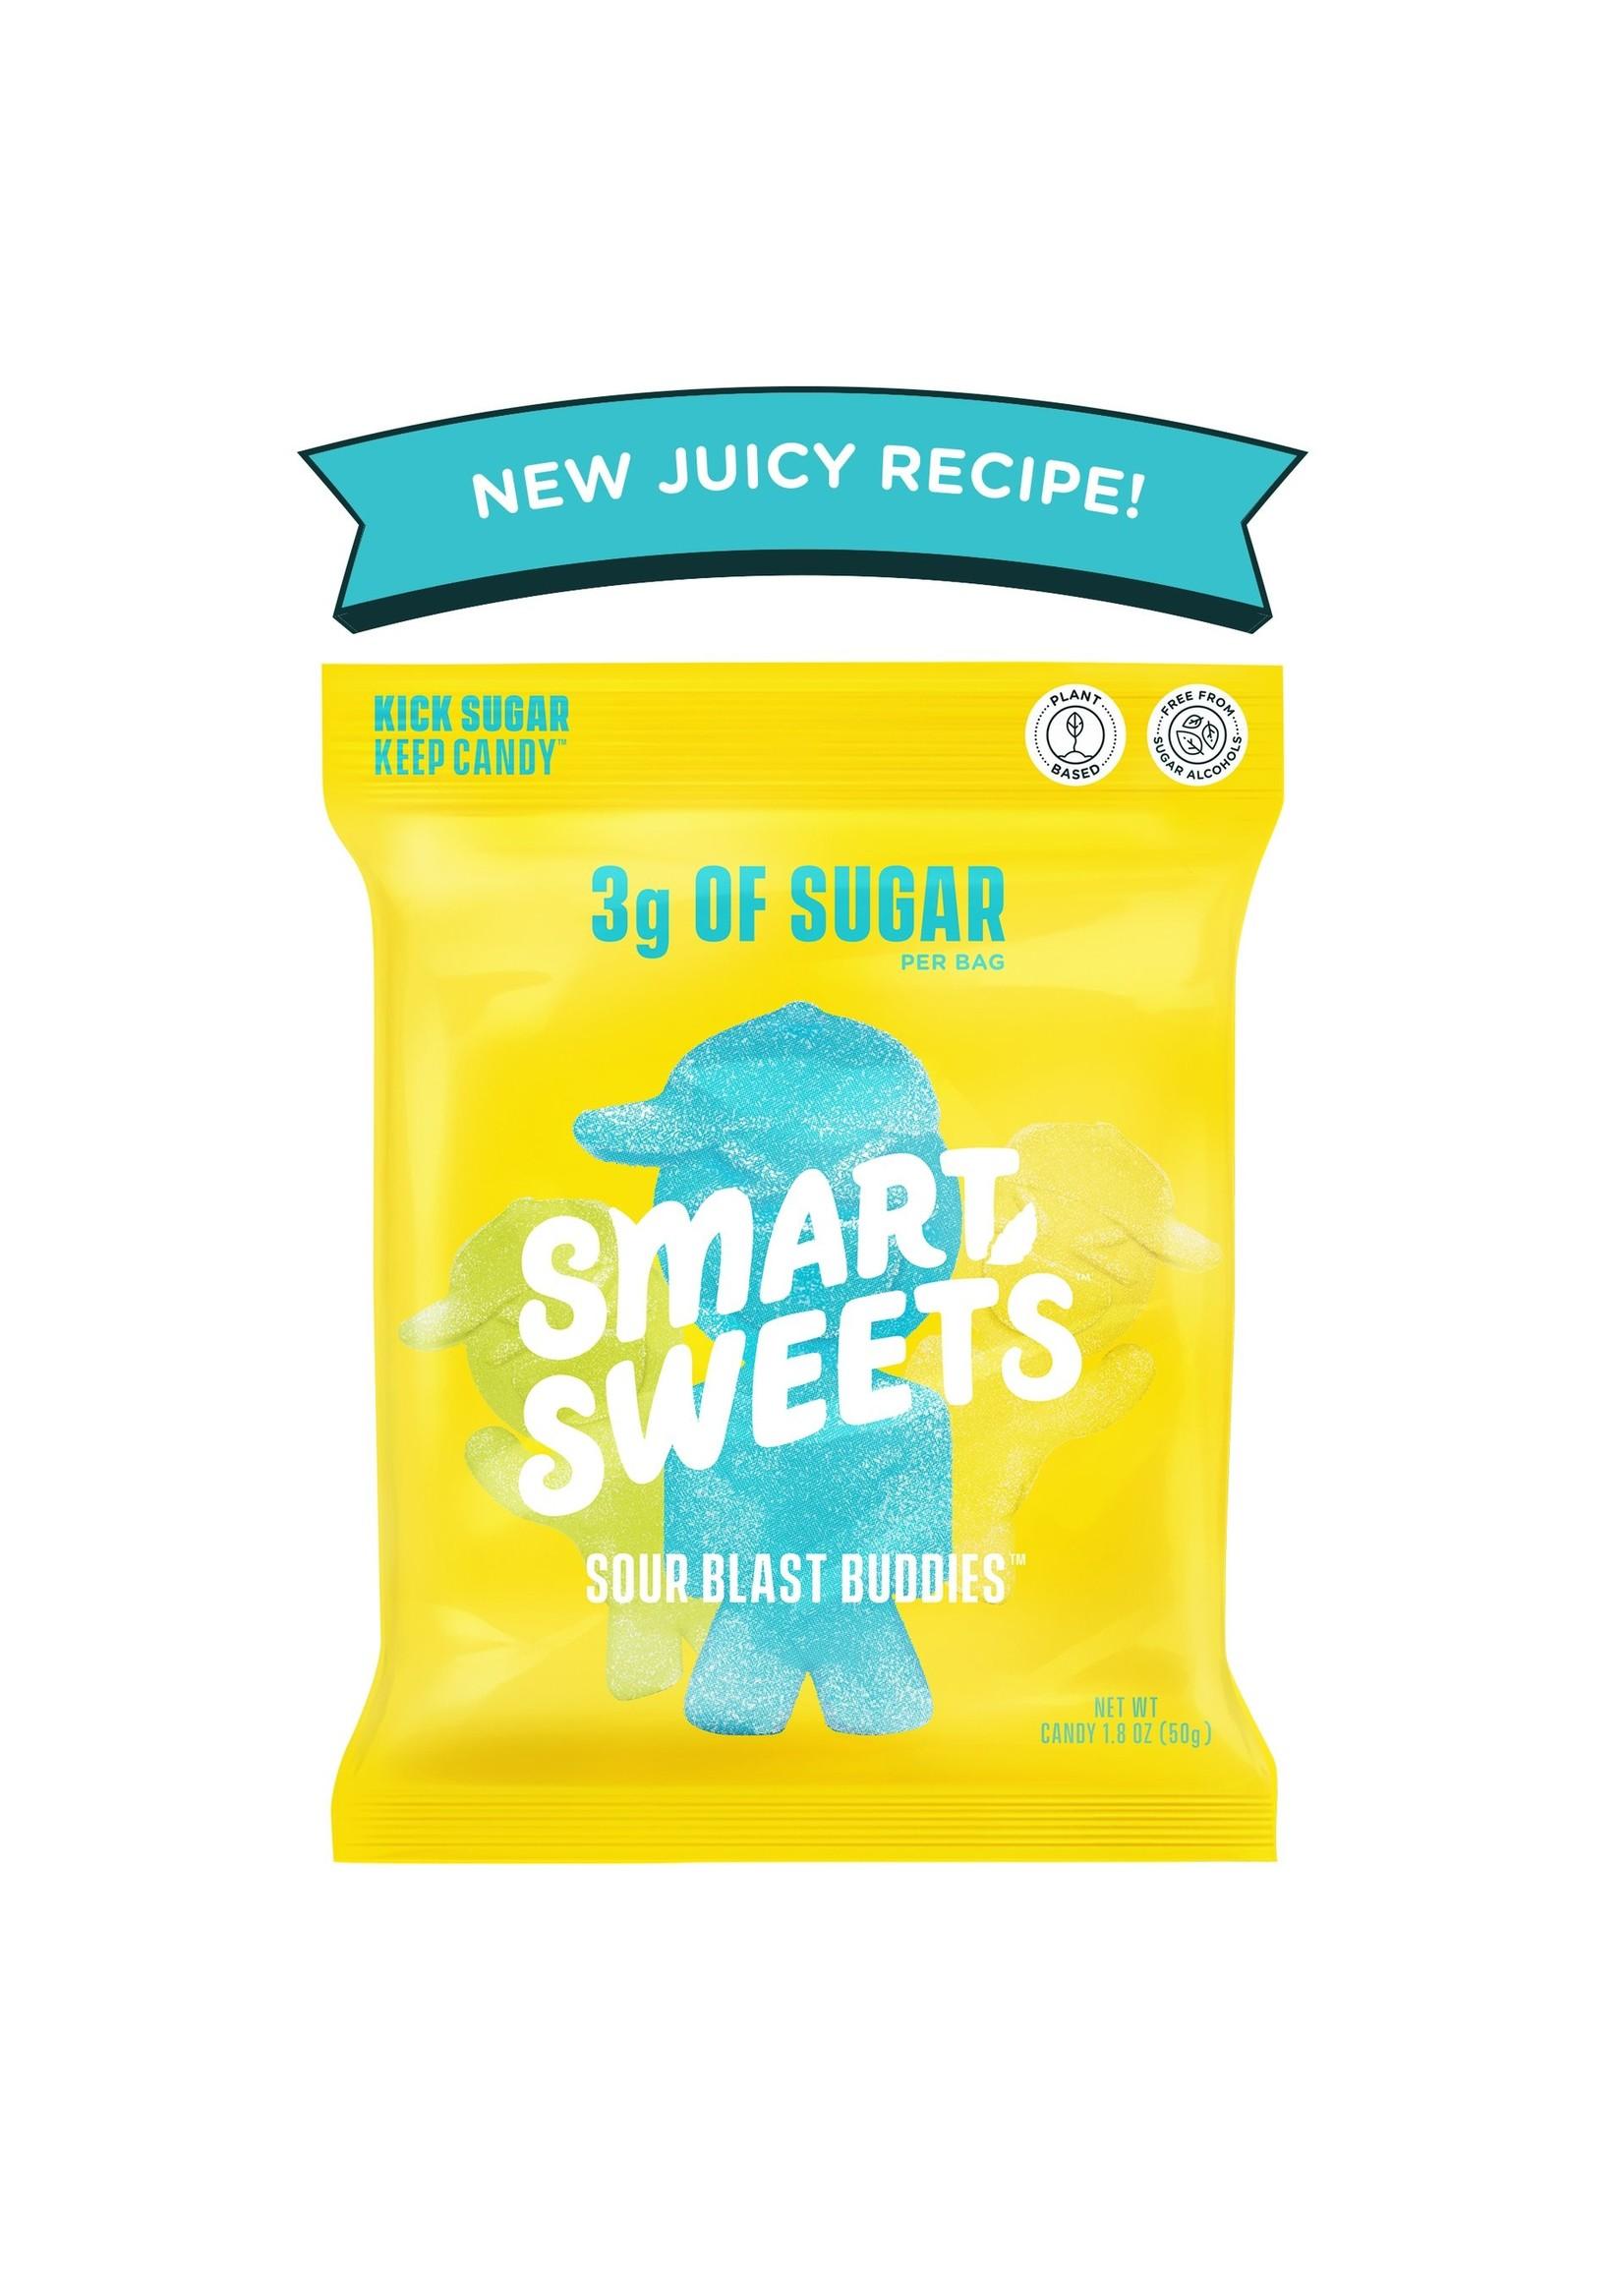 SmartSweets SMARTSWEETS SOUR BLAST BUDDIES 50G